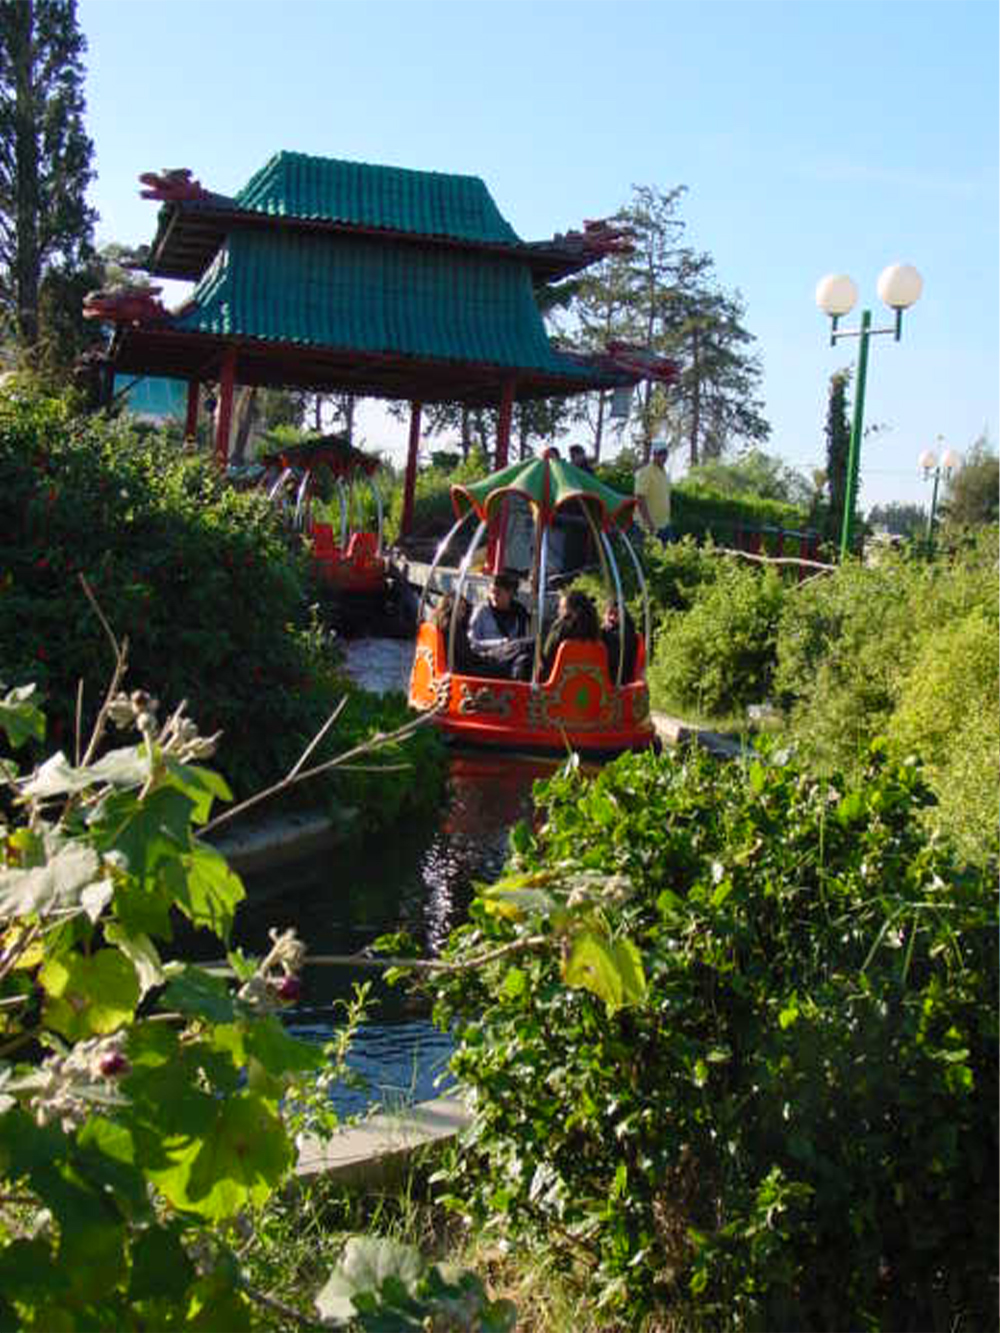 Interlink New Ride : Spin Boat La Riviere Enchantée at Hannibal Park Soukra 6